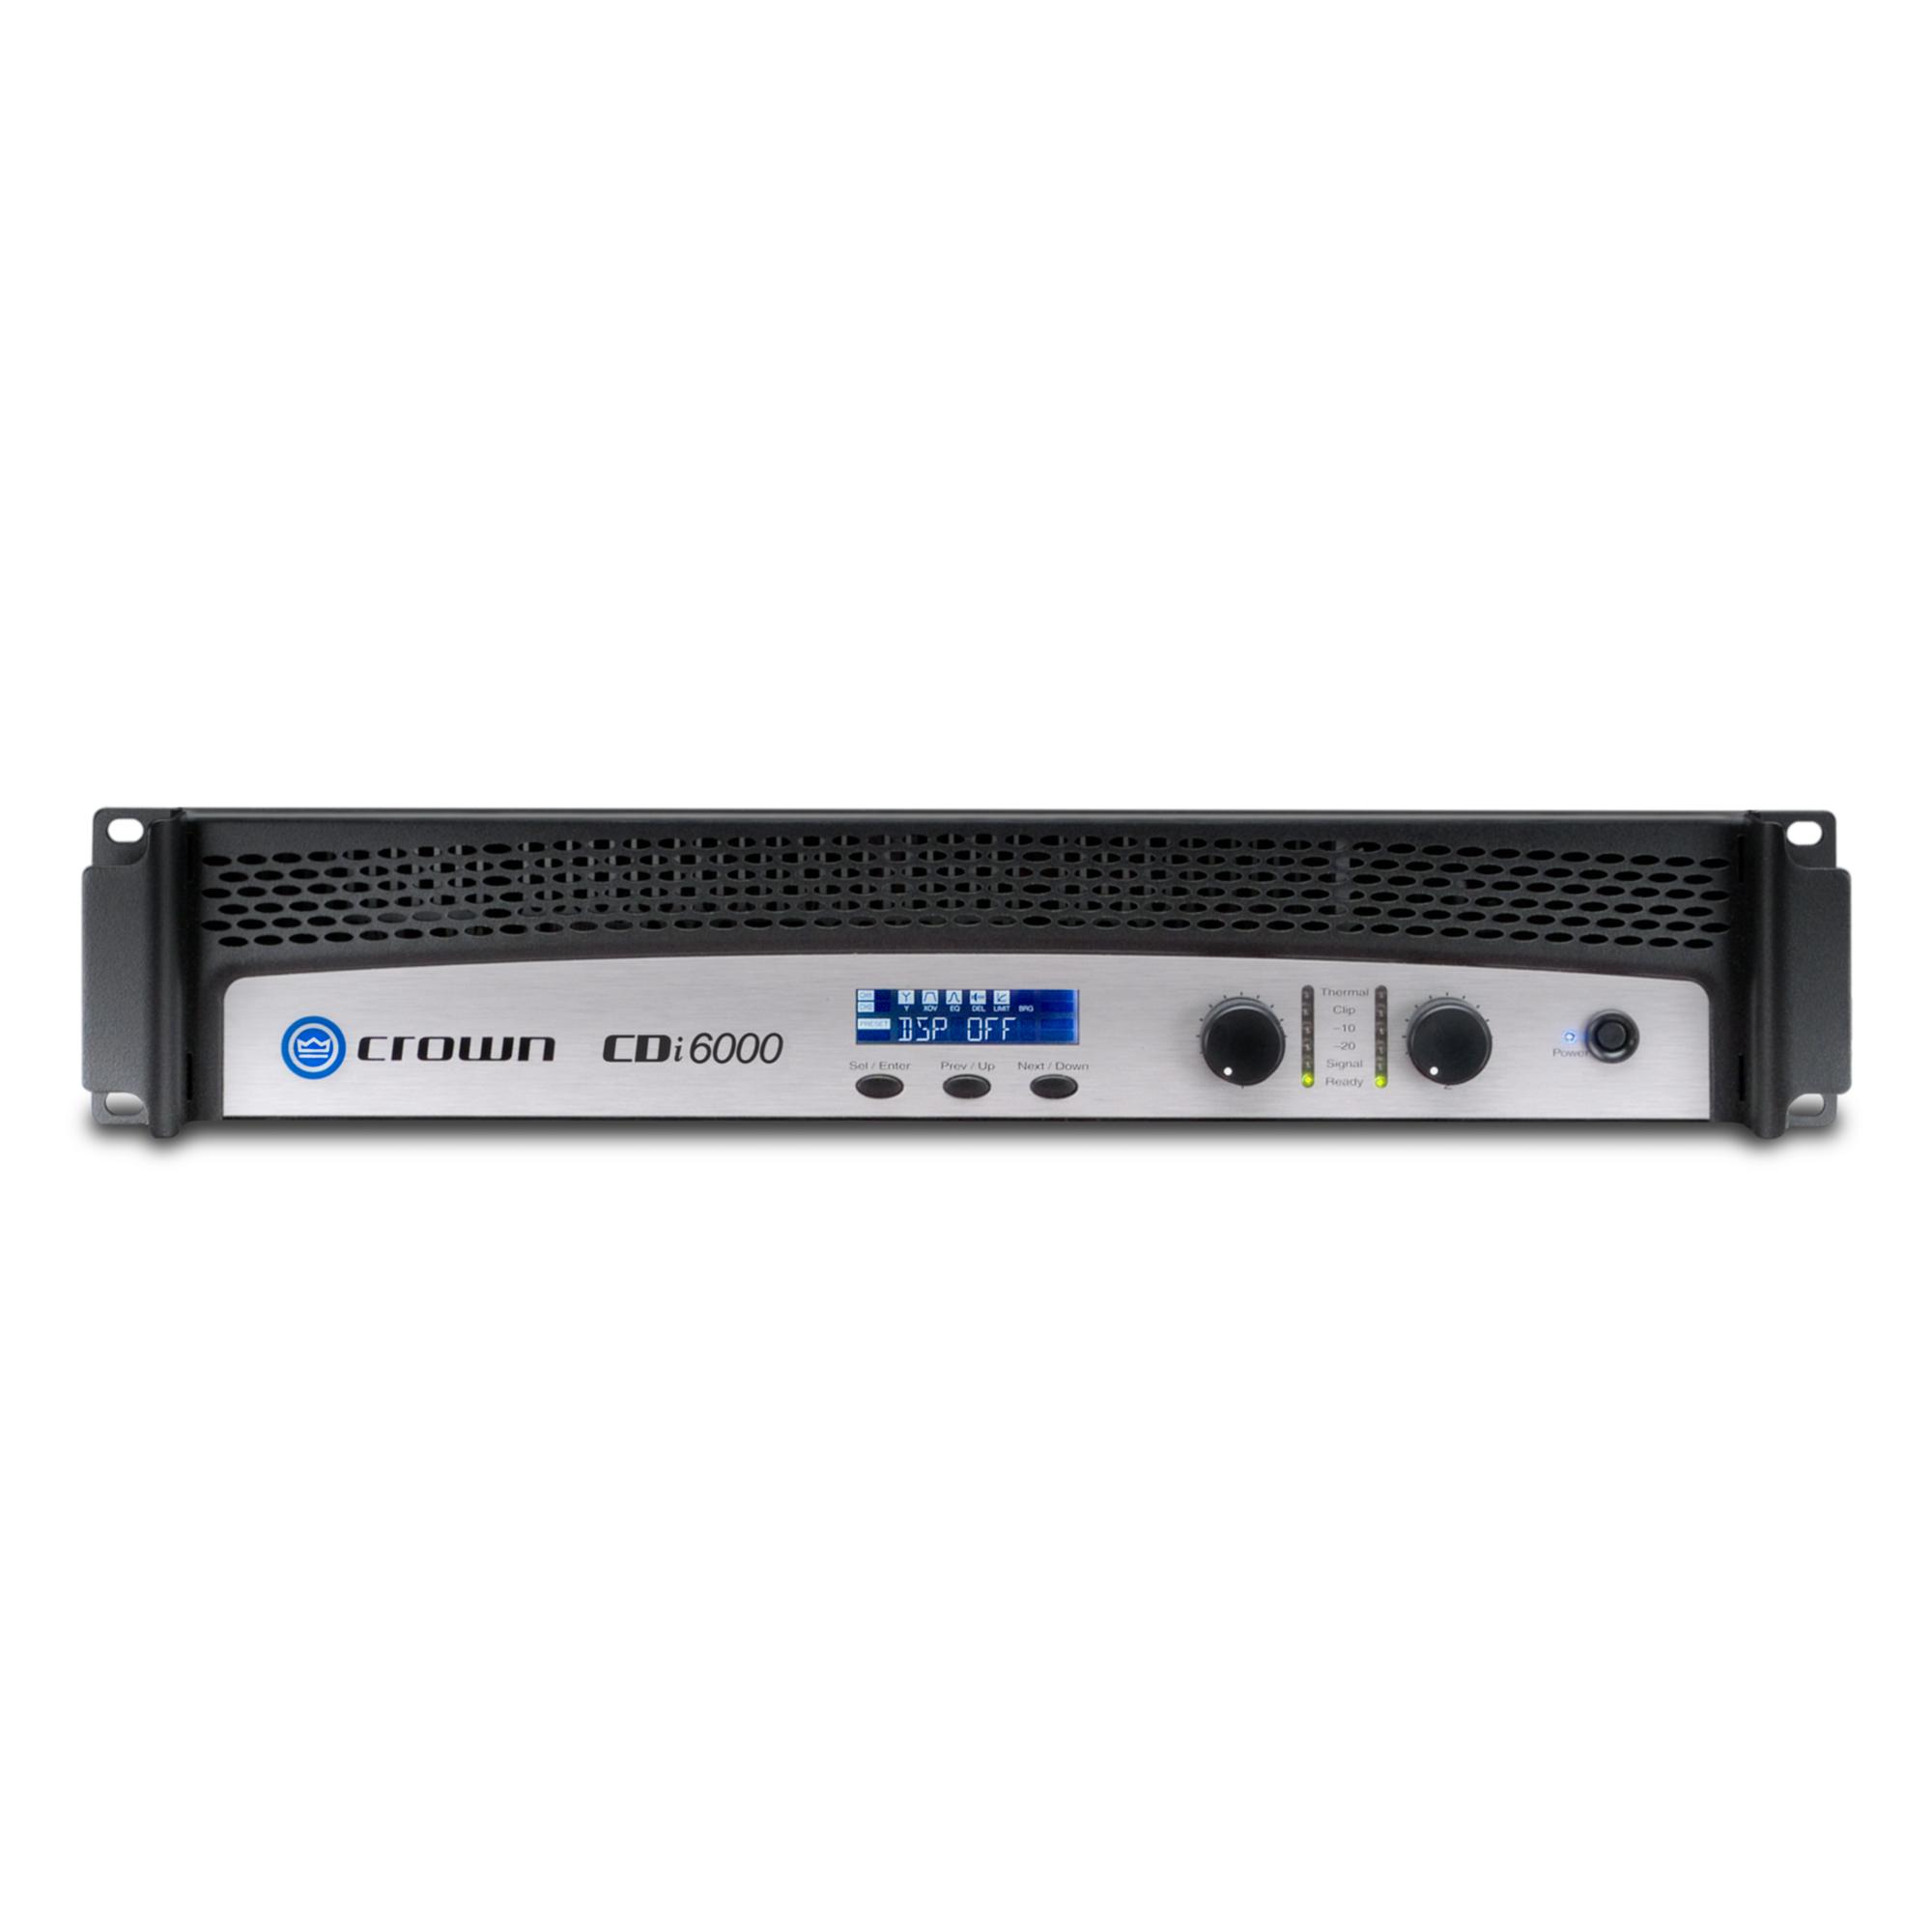 Two-channel, 2100W @ 4Ω, 70V/140V Power Amplifier